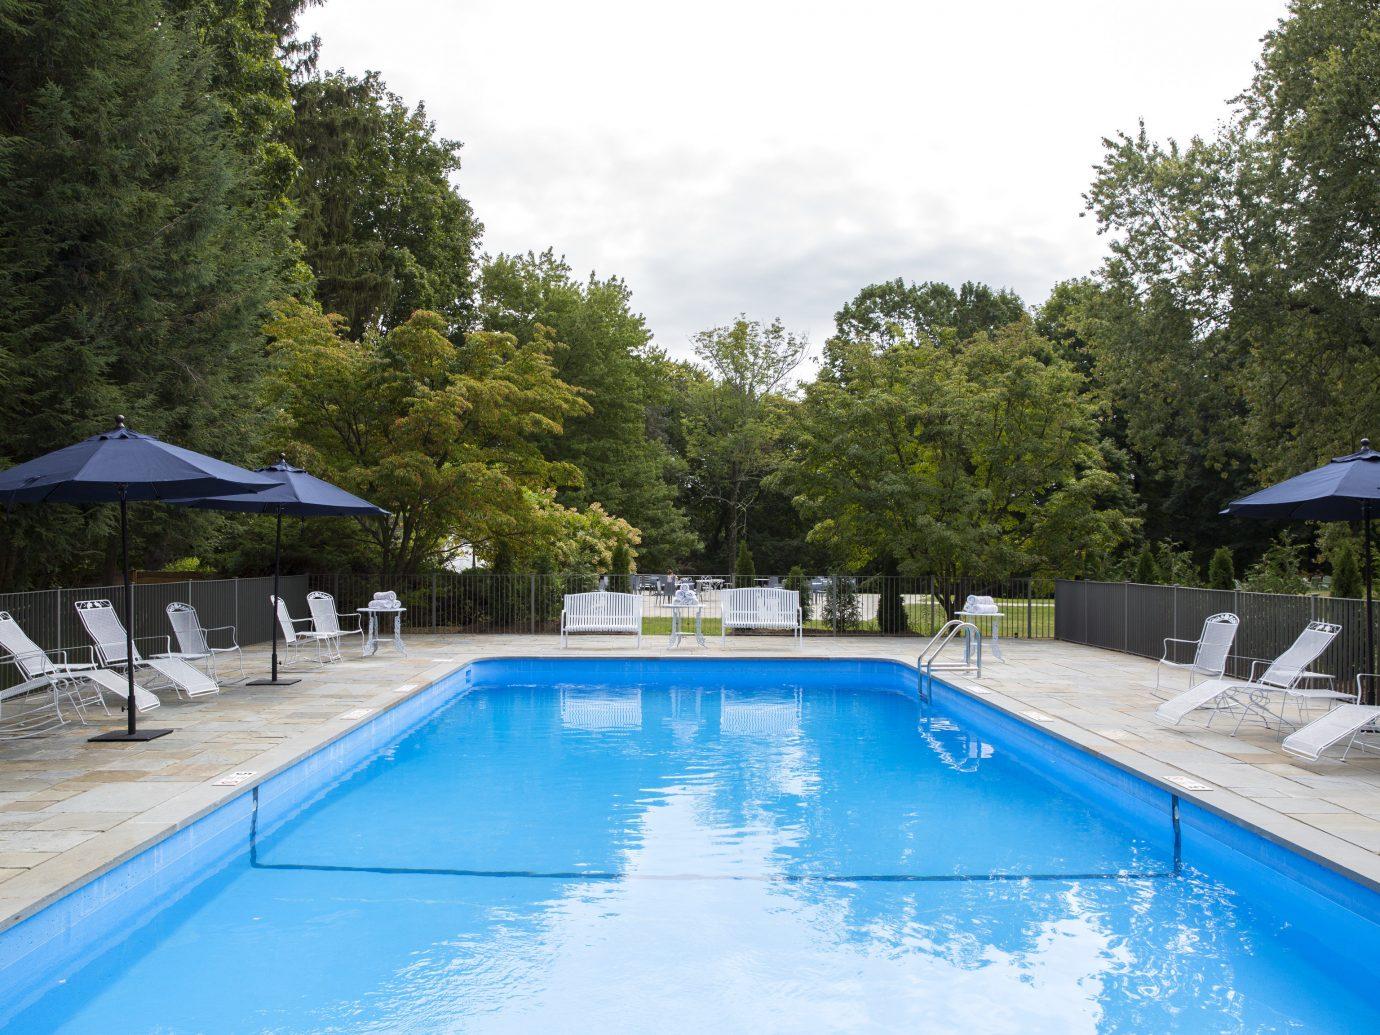 Hotels New York Romantic Hotels tree outdoor swimming pool Pool leisure property estate backyard Resort Villa blue swimming